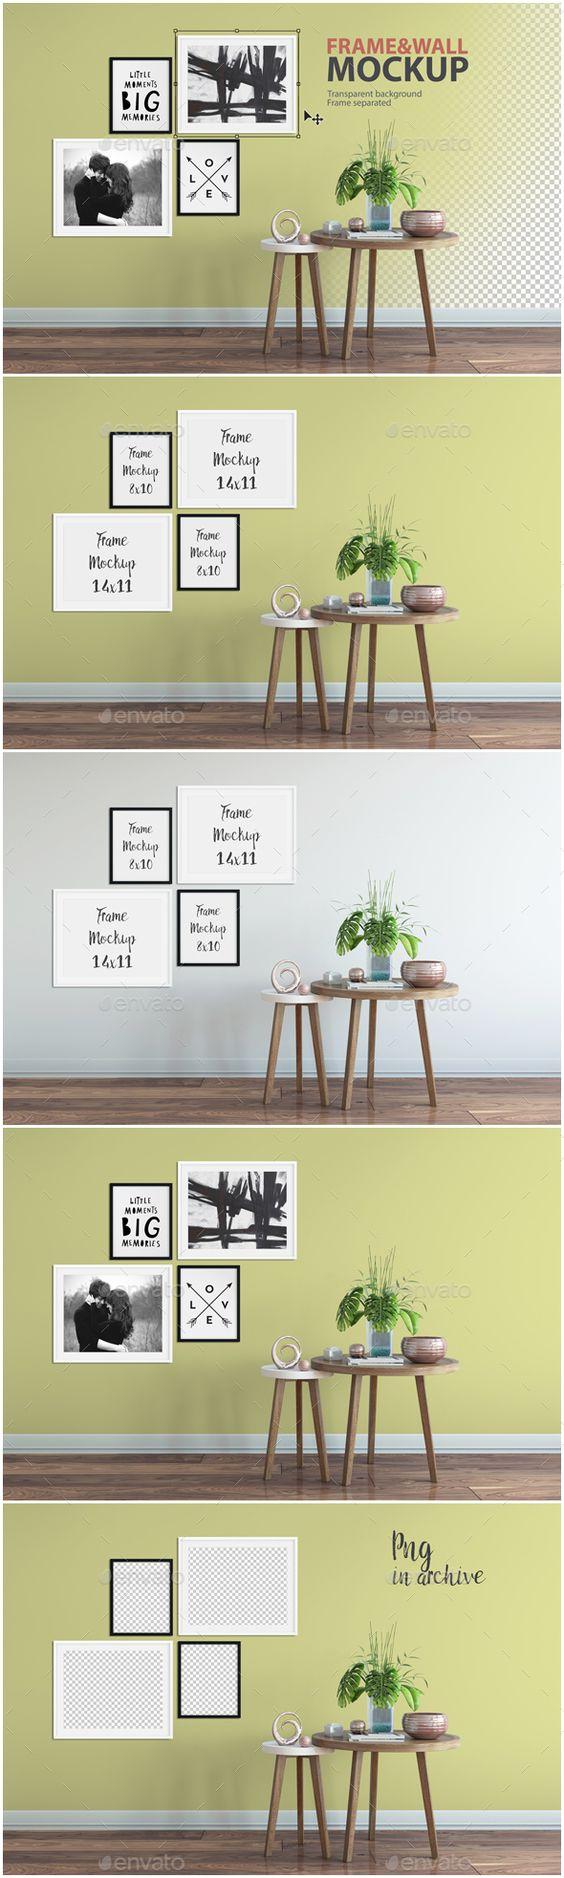 Frame & Wall Mockup 03